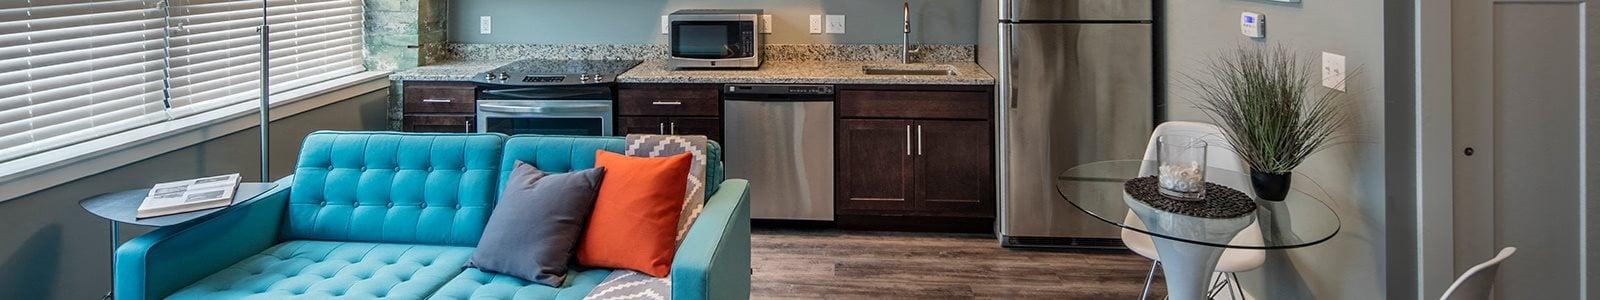 Lofts on Alabama - Grand Rapids Apartments